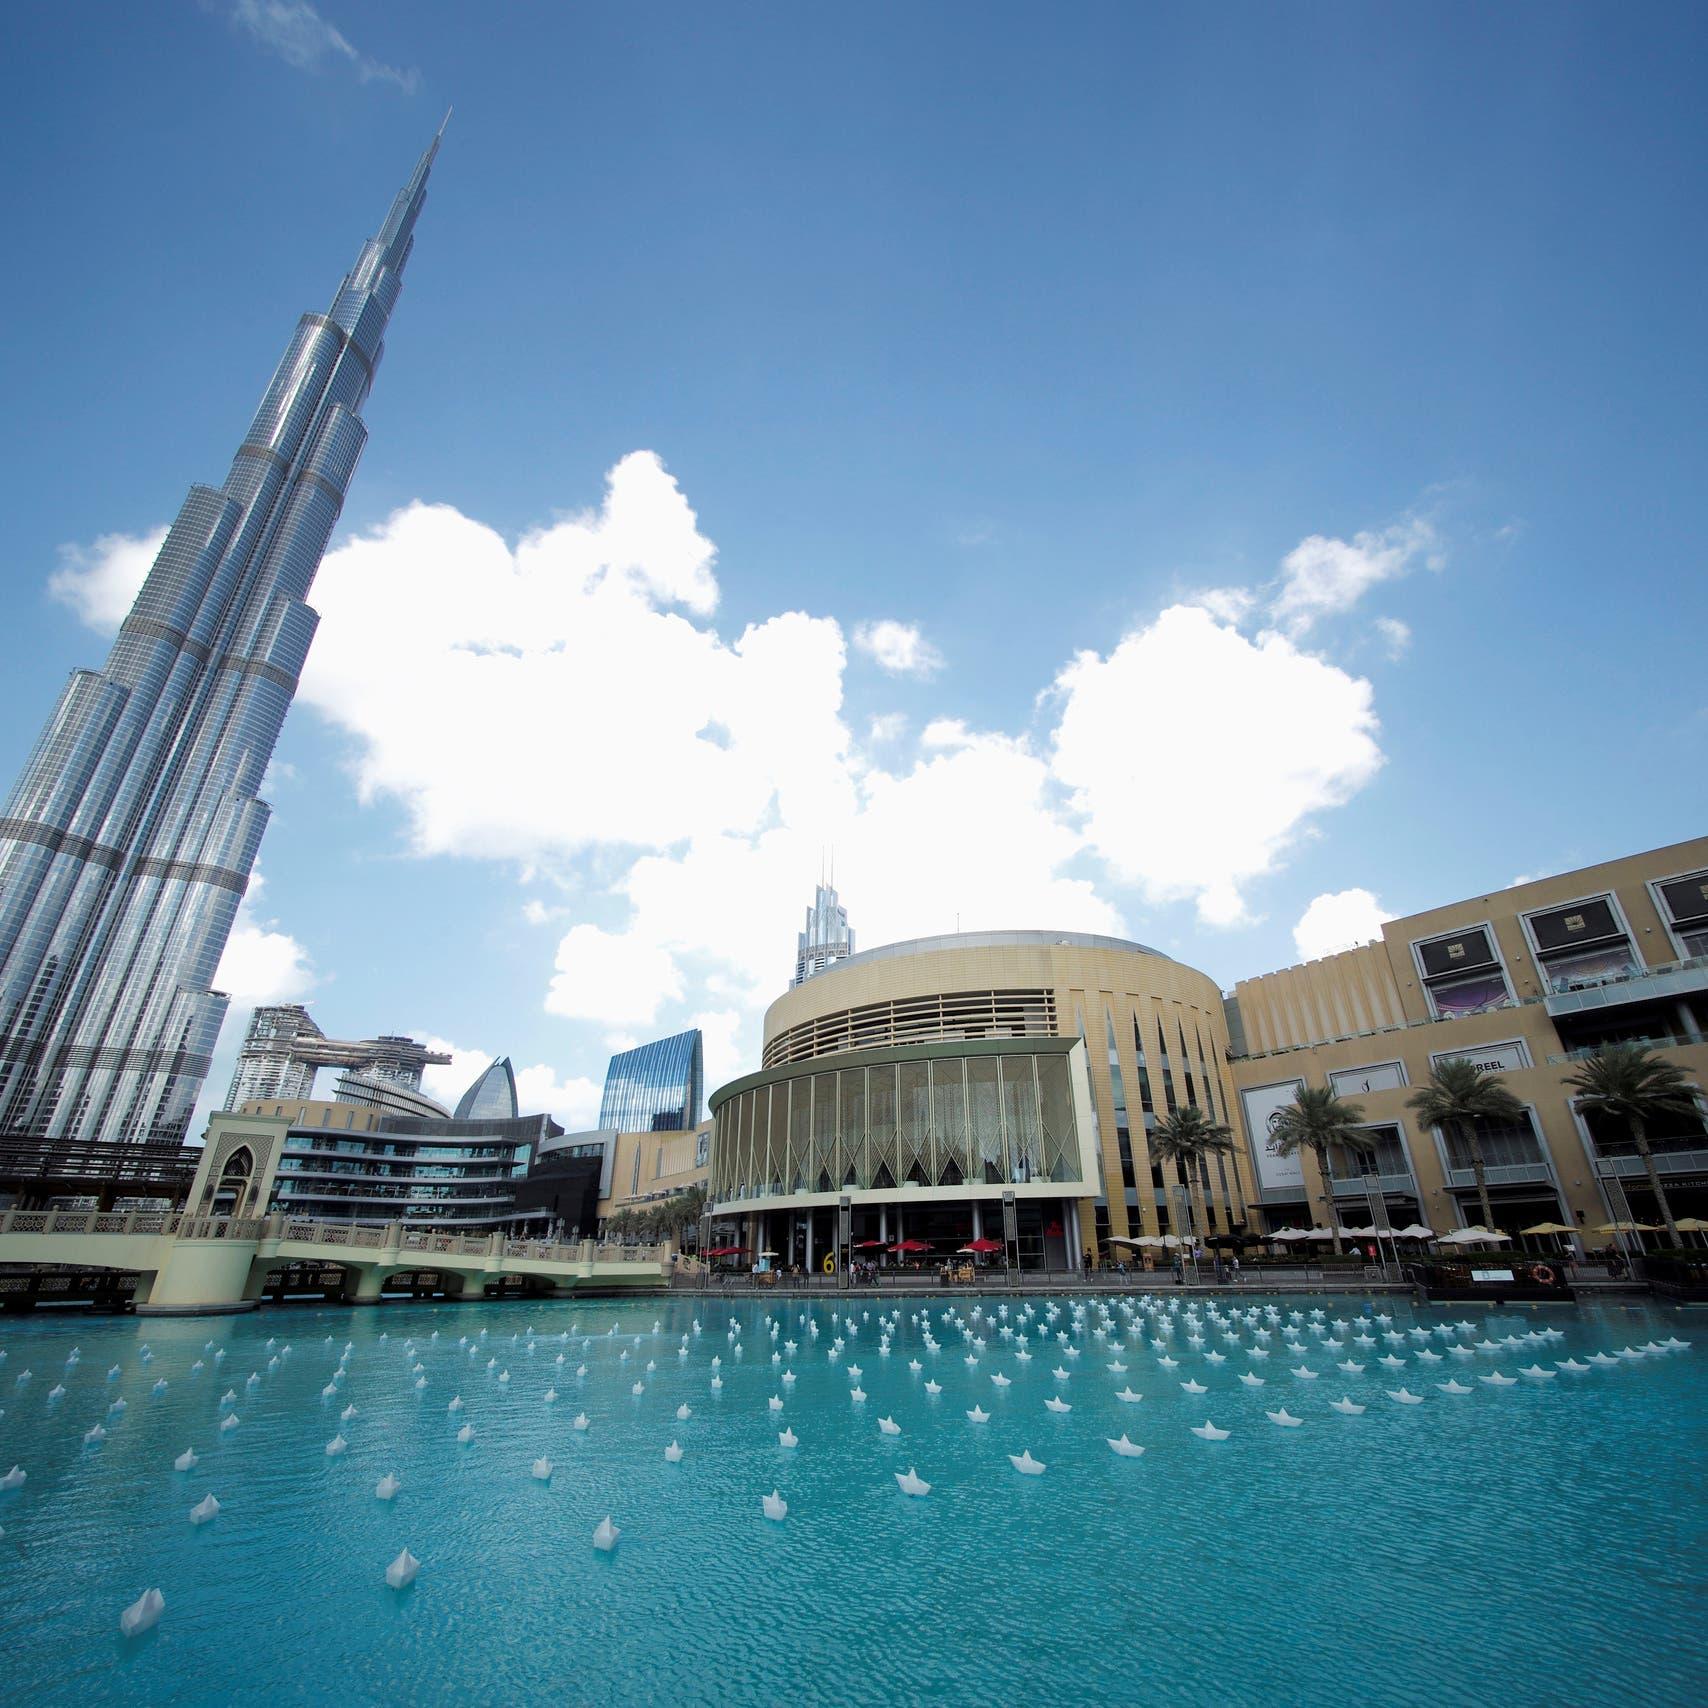 Coronavirus: Dubai's latest COVID-19 rules for weddings, restaurants, gyms, concerts